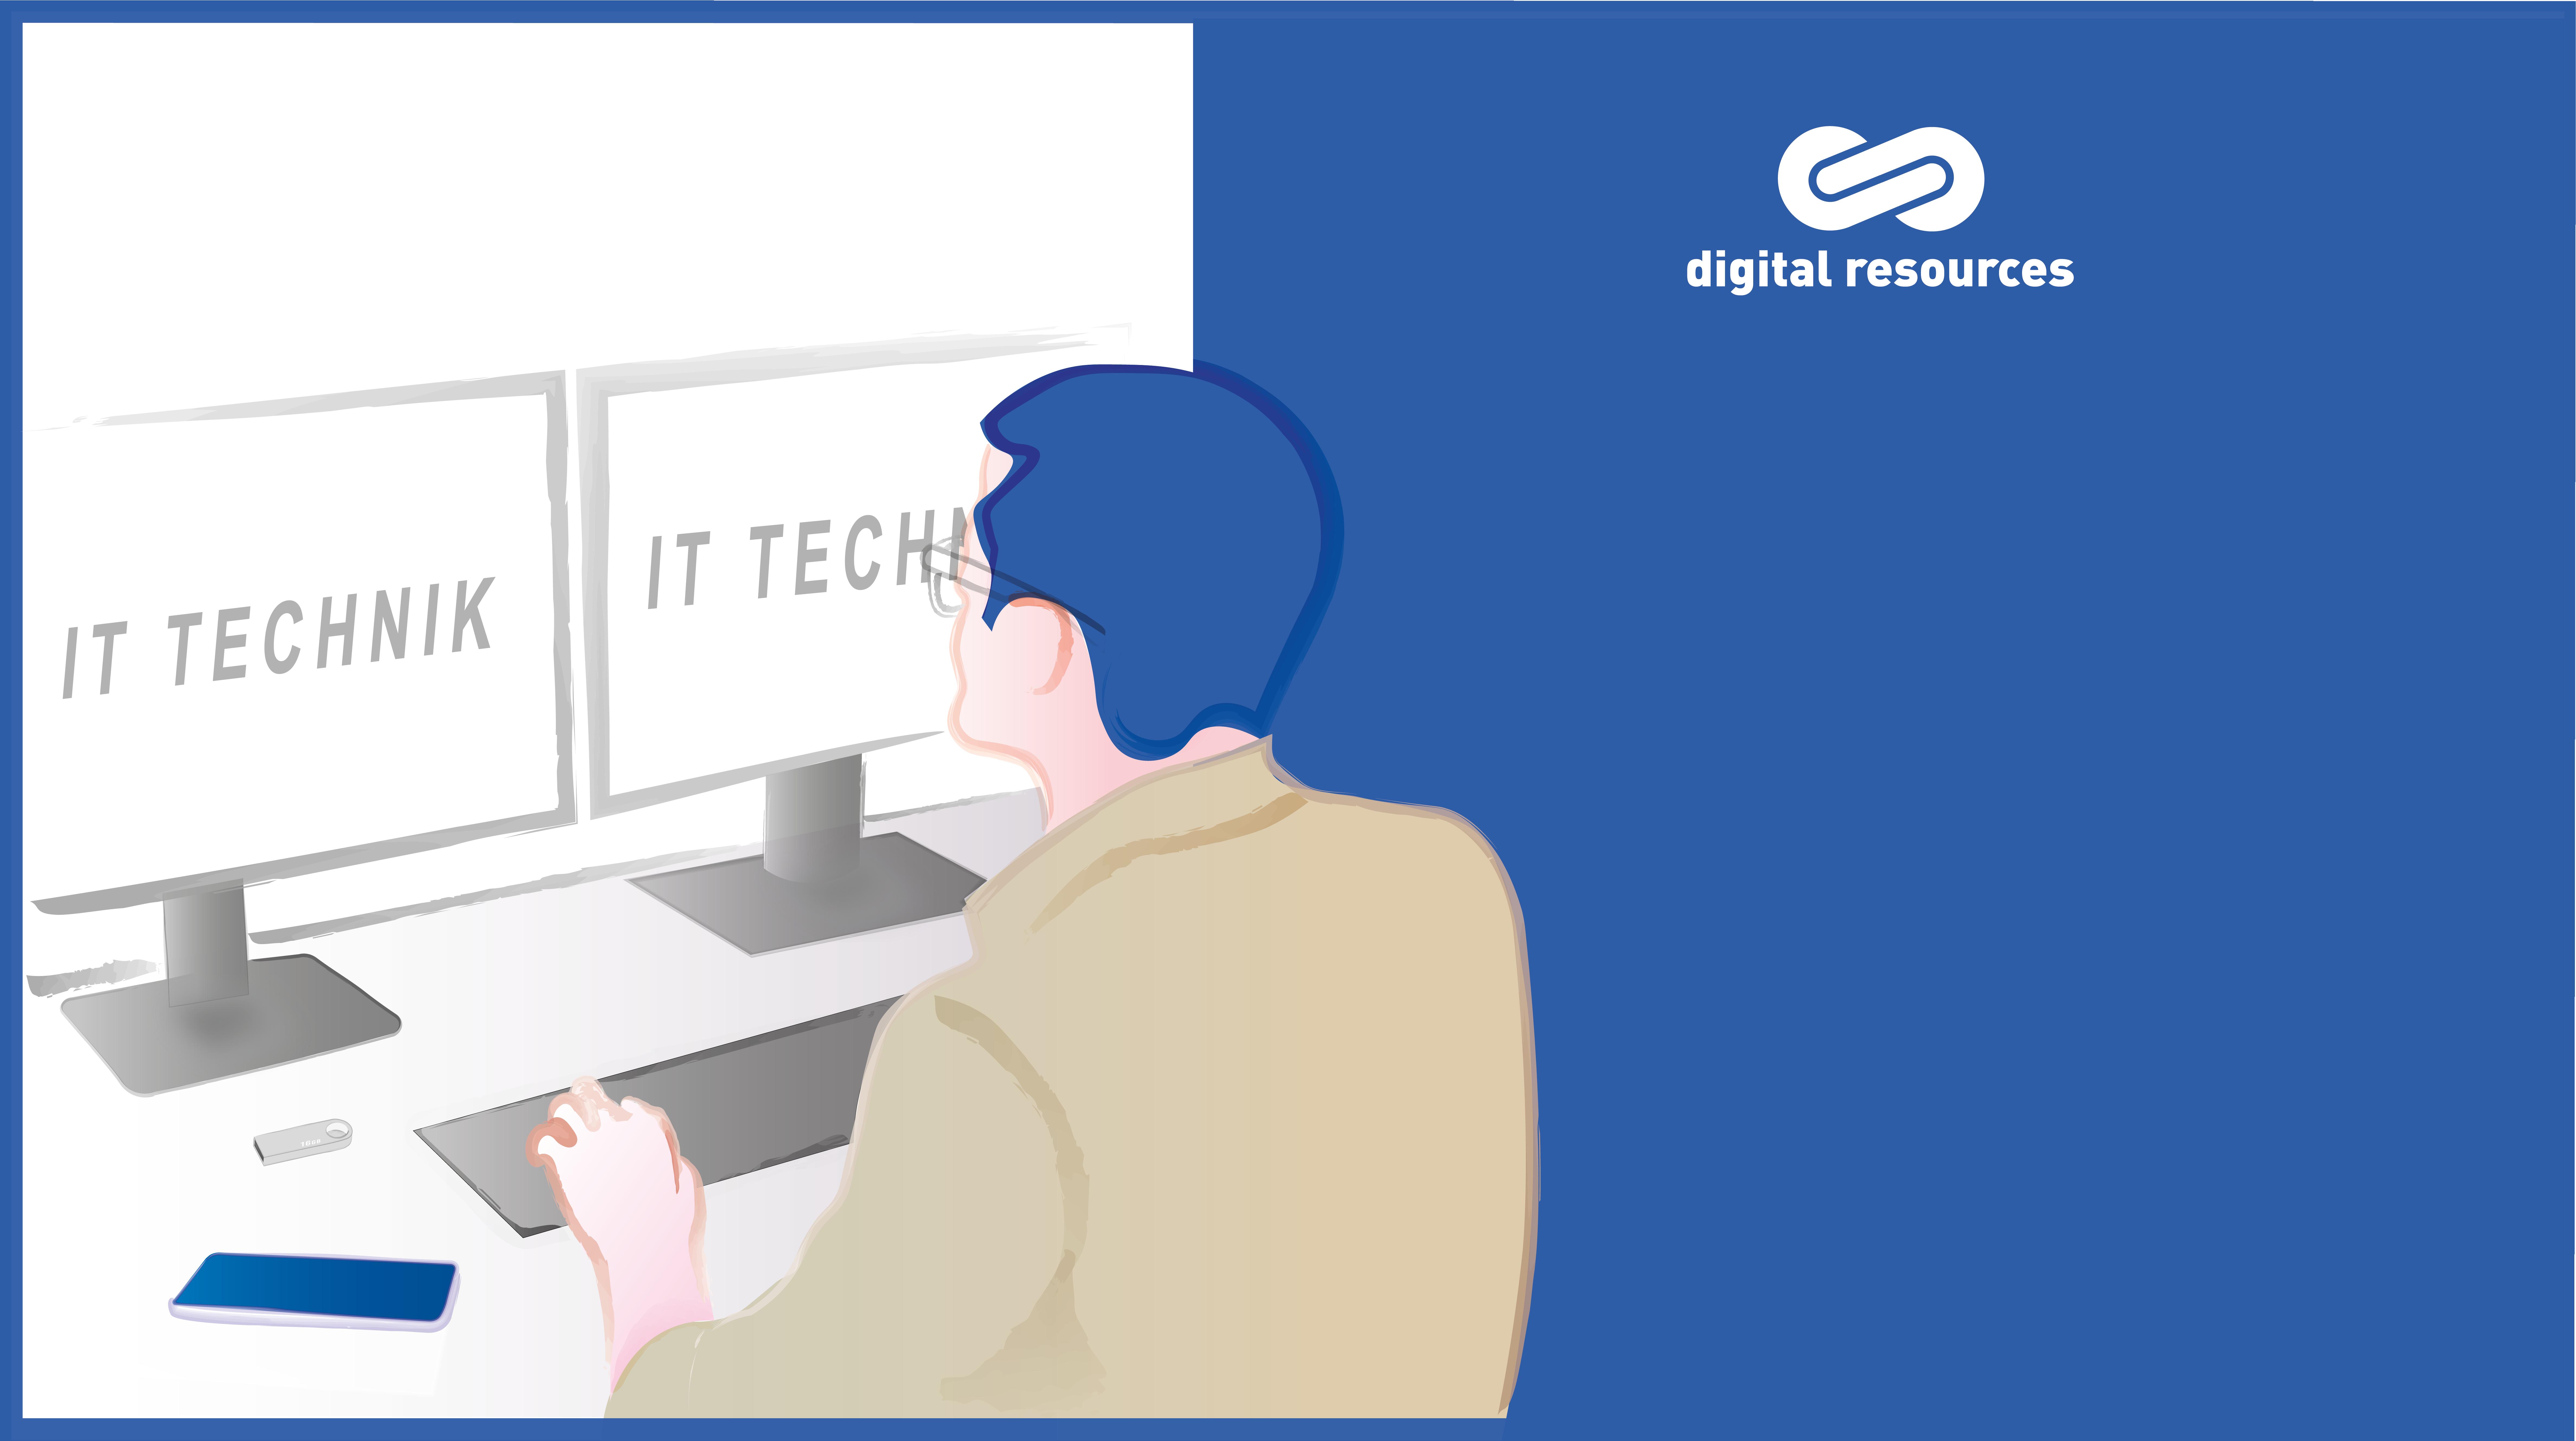 Inzerat-IT_technik